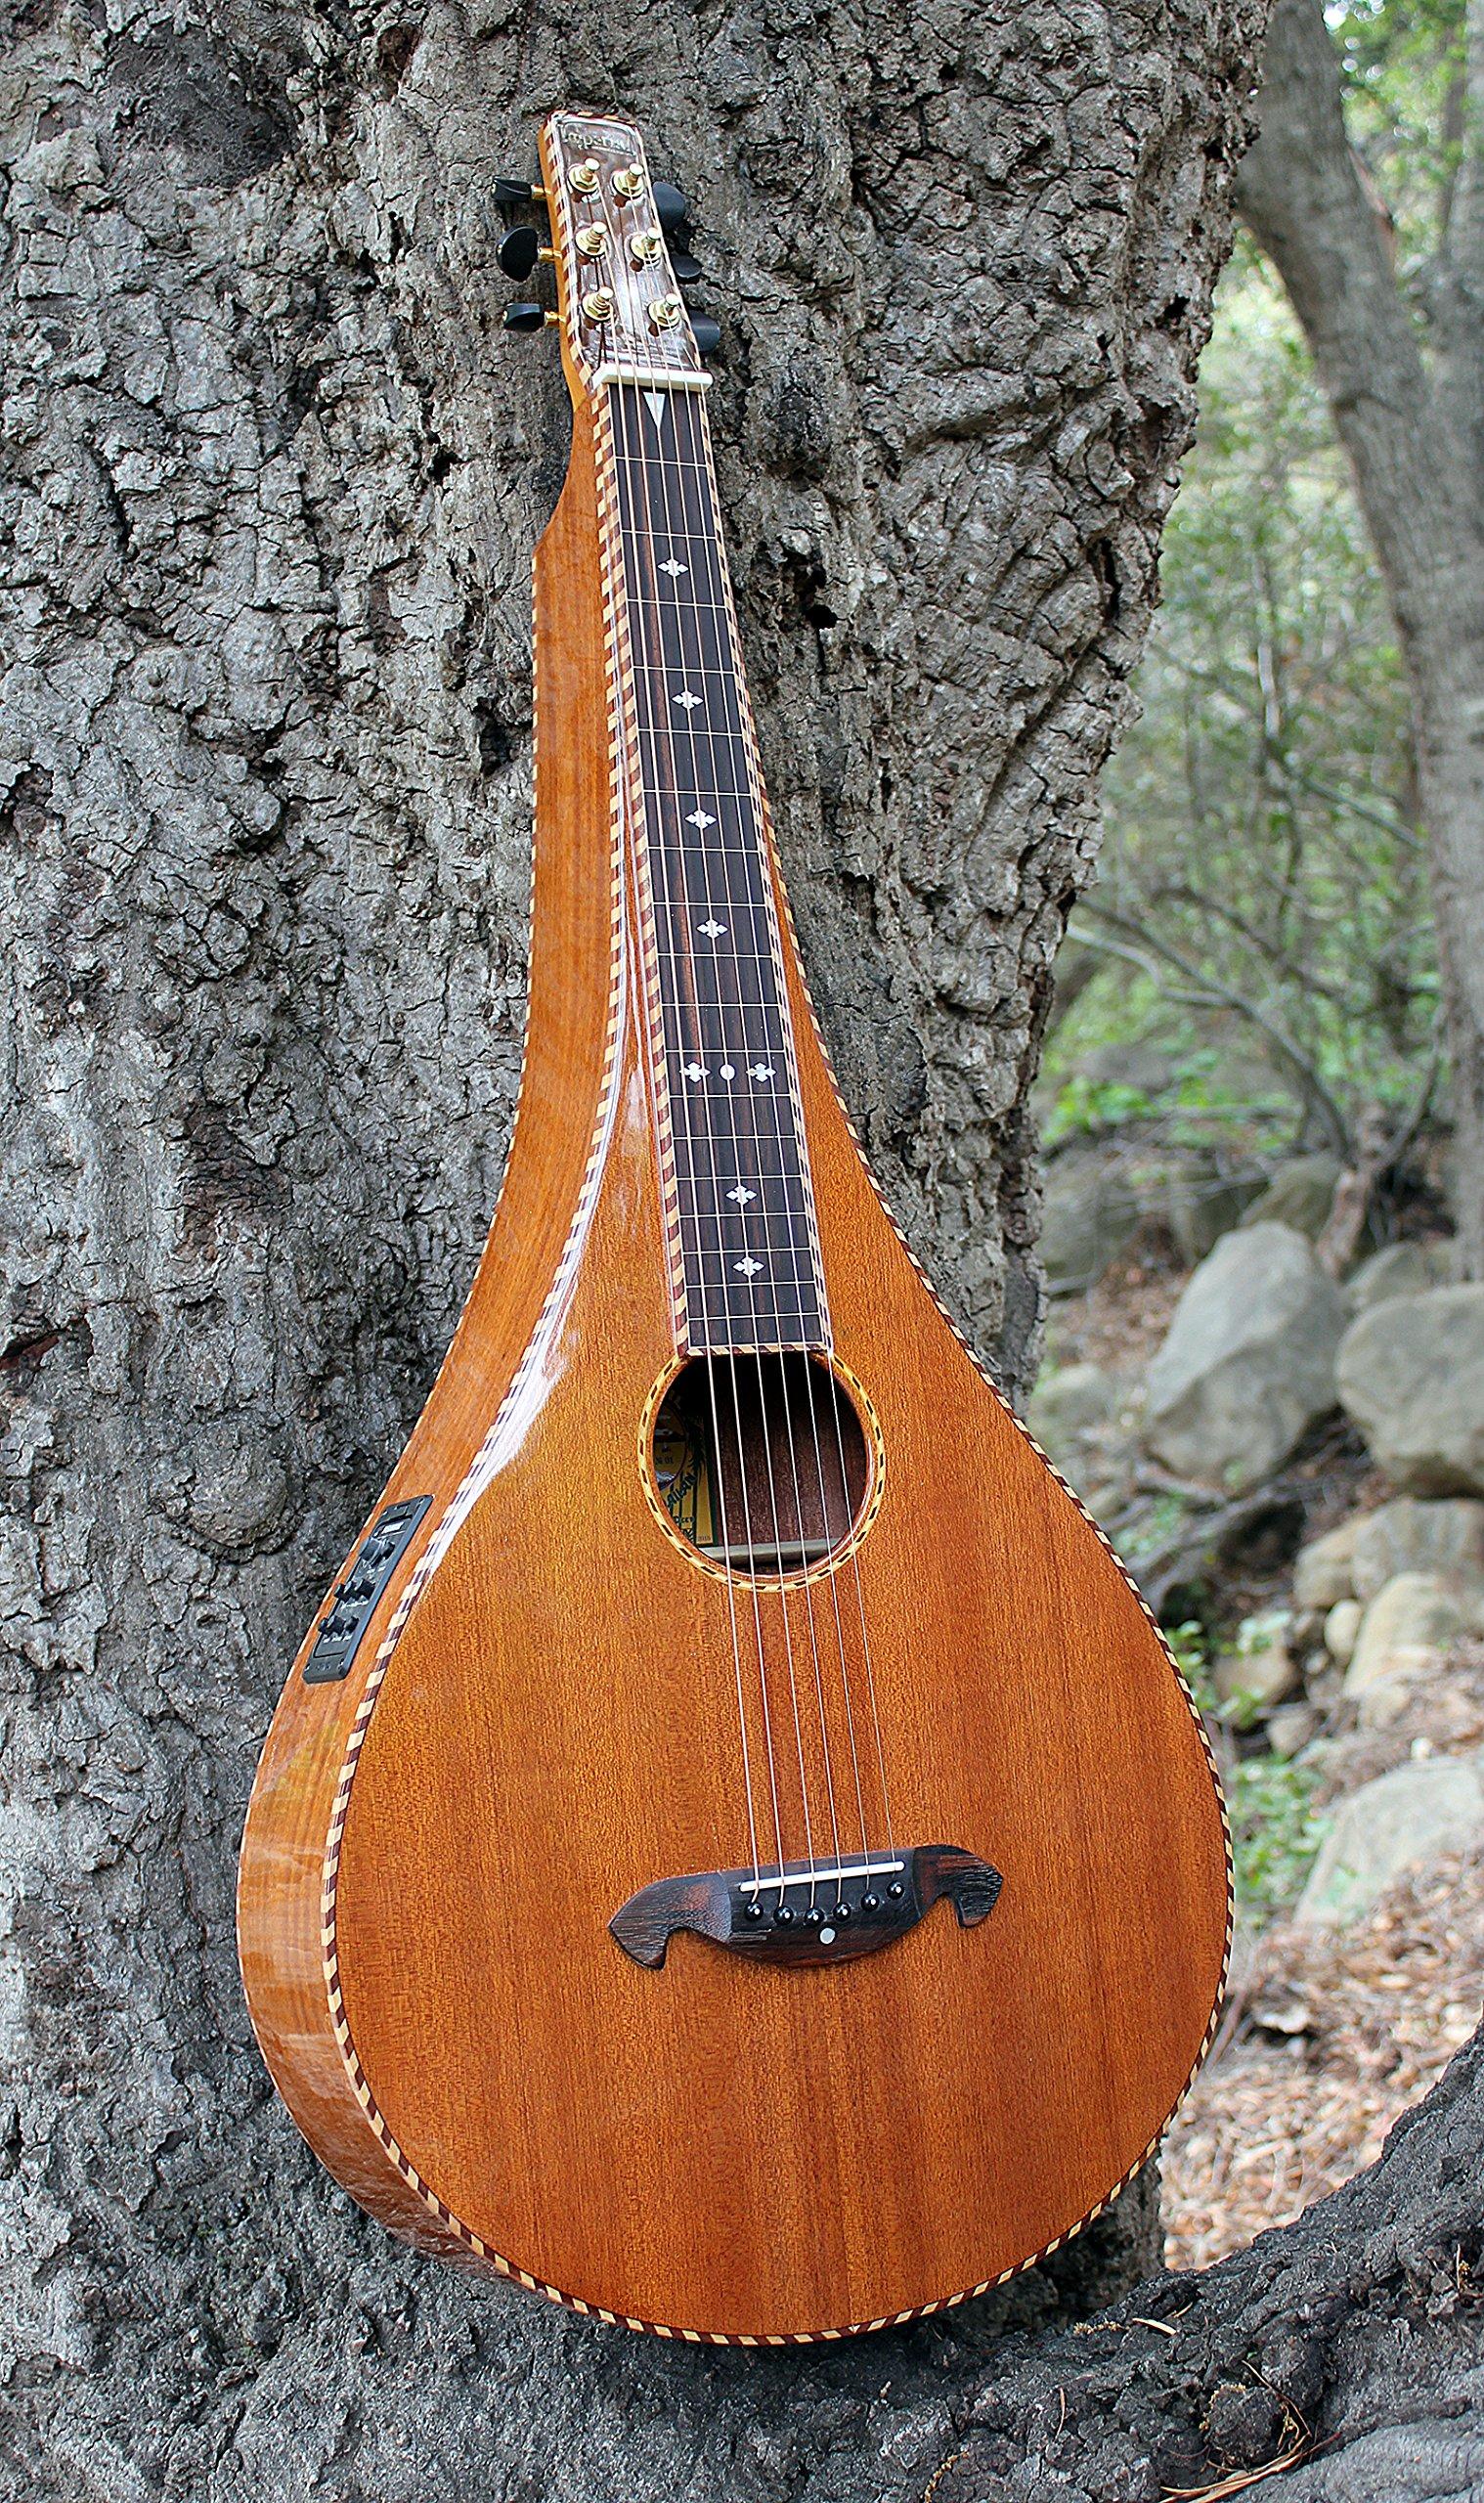 Imperial Royal Hawaiian Limited Edition Teardrop Weissenborn Style Lap Steel Guitar